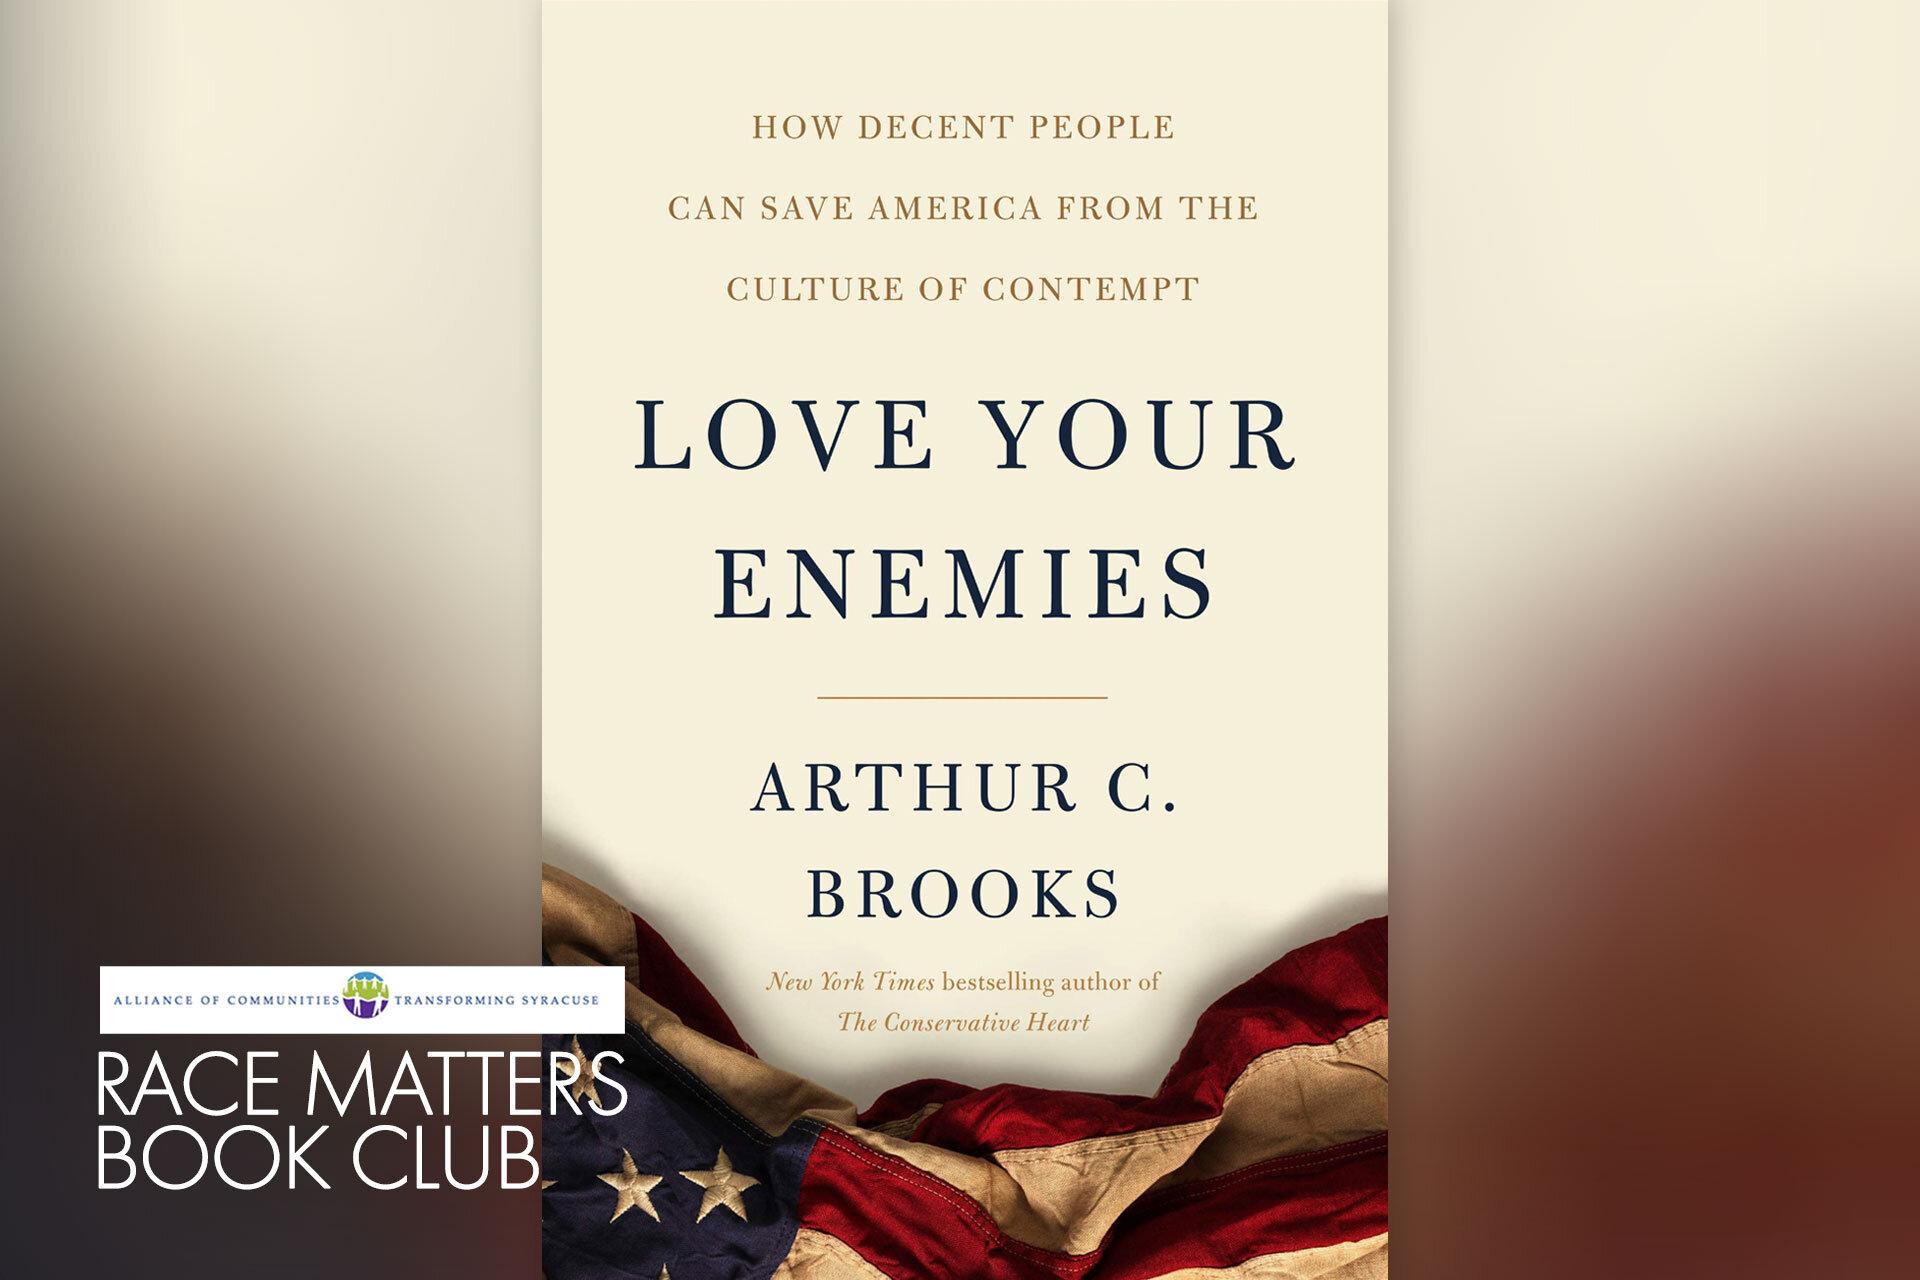 race-matters-book-club-event-thumb.jpg